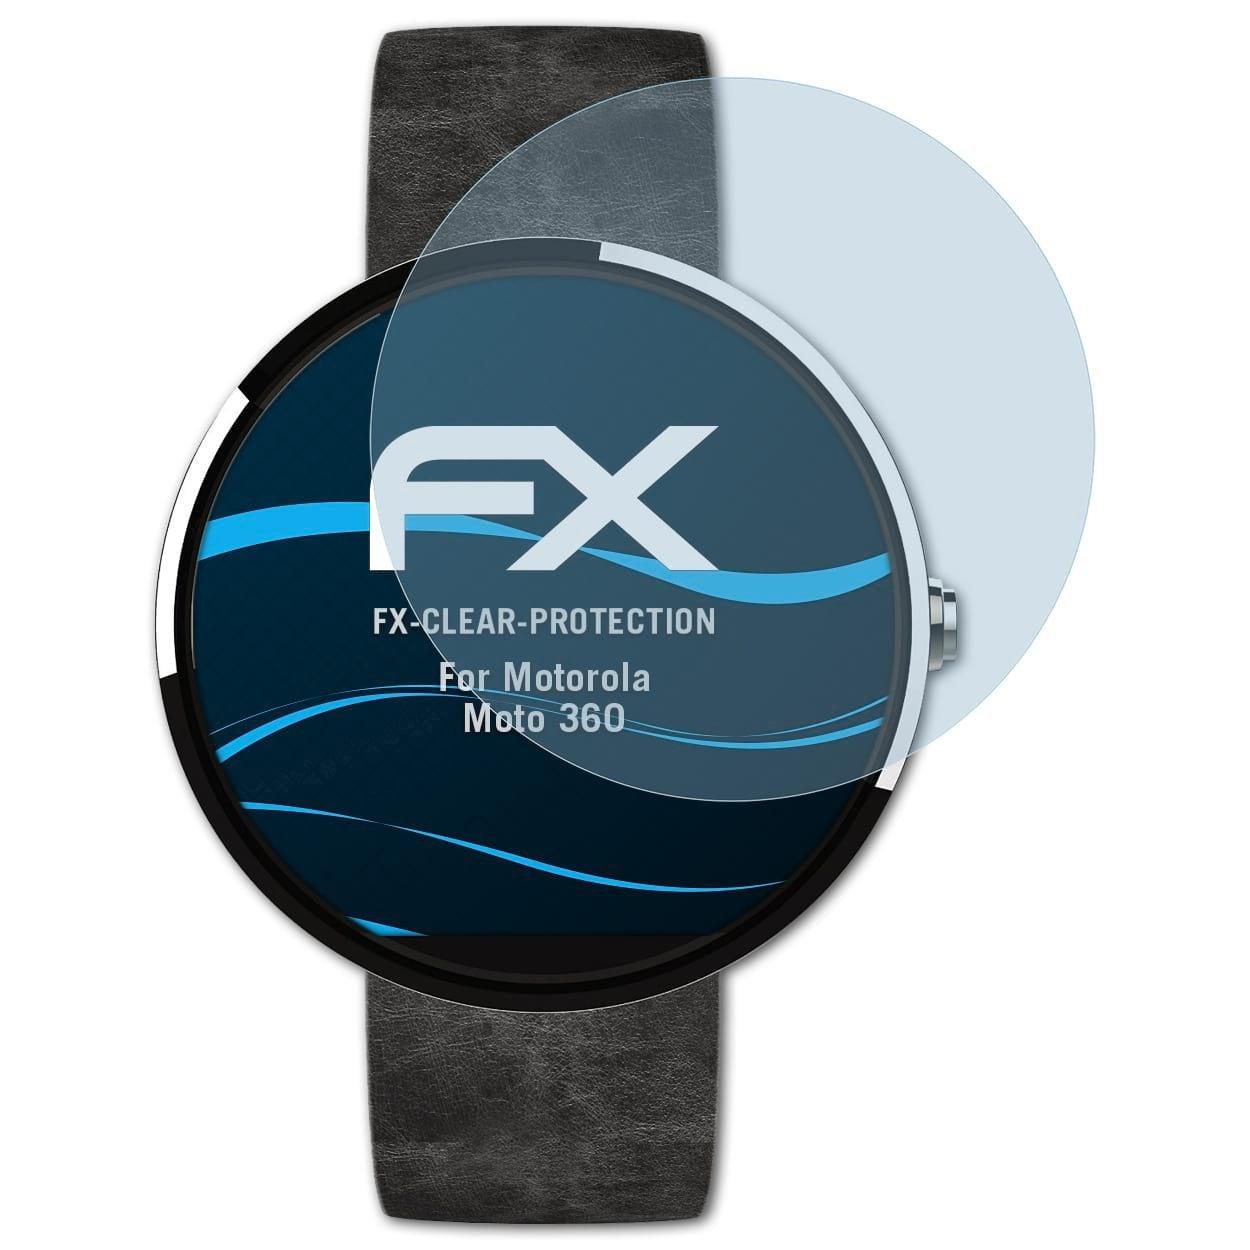 atFoliX Lámina Protectora de Pantalla Compatible con Motorola Moto 360 Película Protectora, Ultra Transparente FX Lámina Protectora (3X)